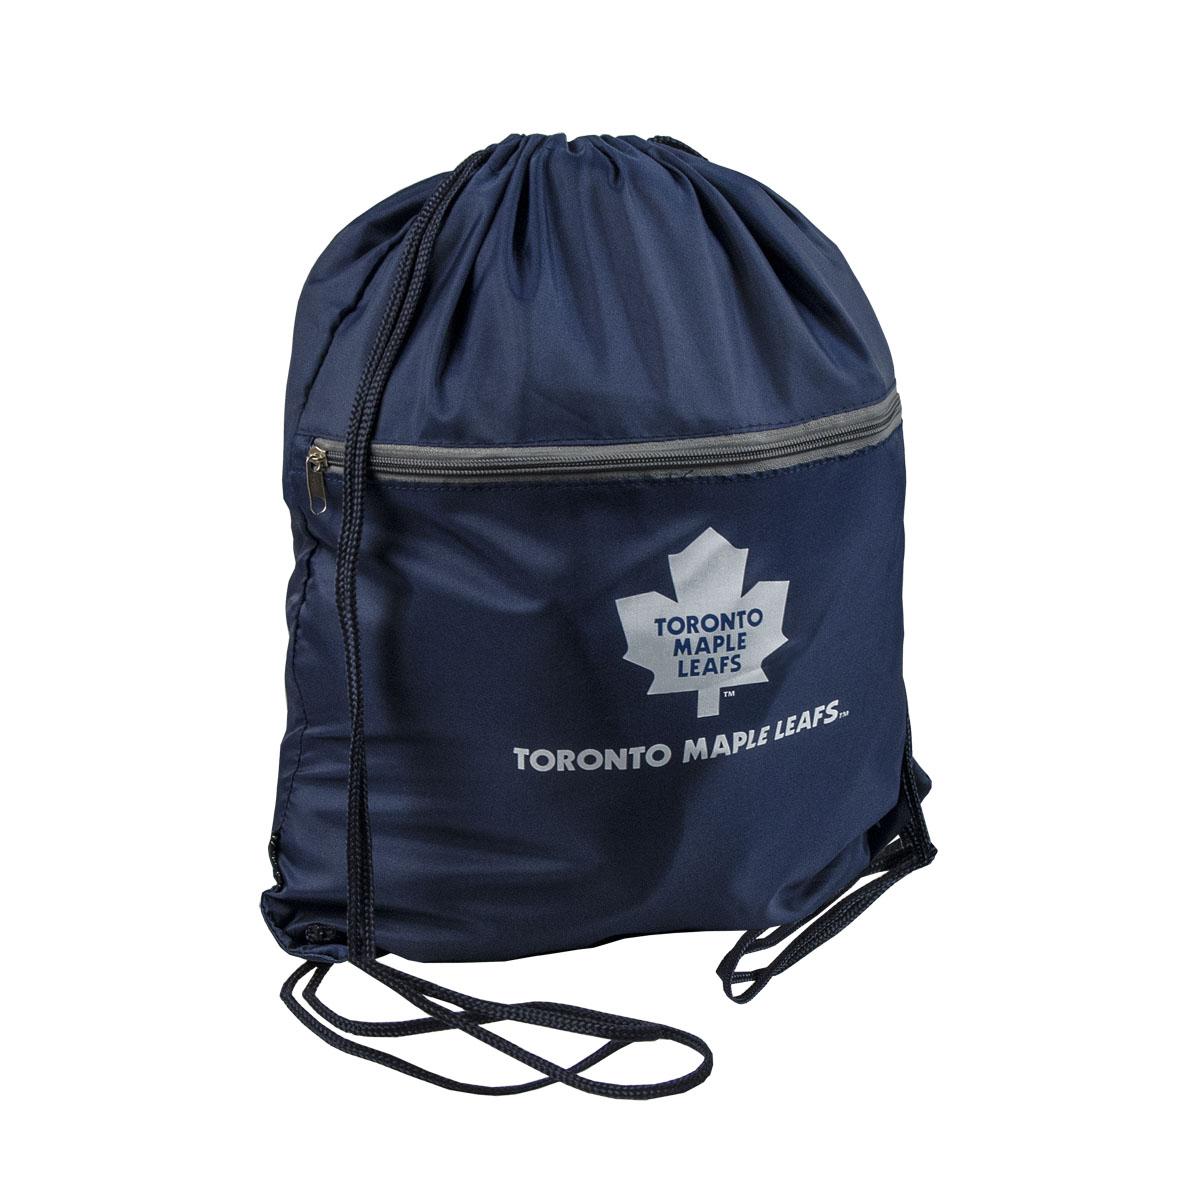 Мешок на шнурке NHL  Maple Leafs , цвет: синий, 15 л - Хоккейные клубы